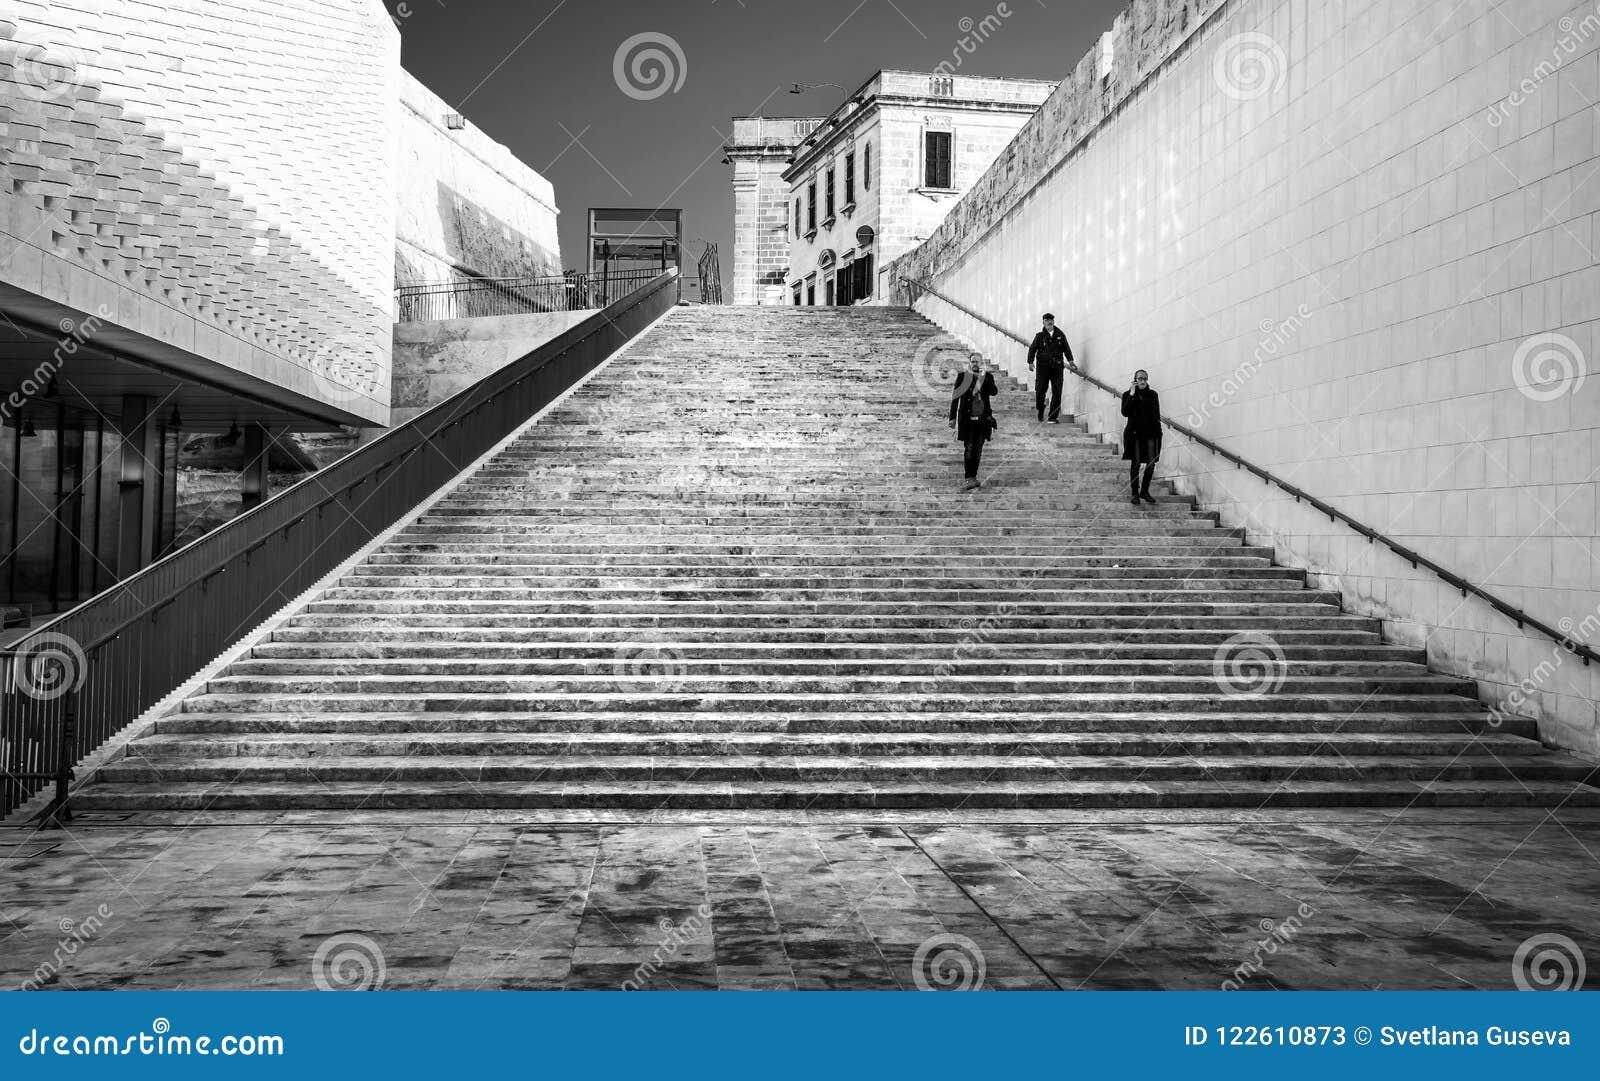 modern architecture of valletta malta black and white